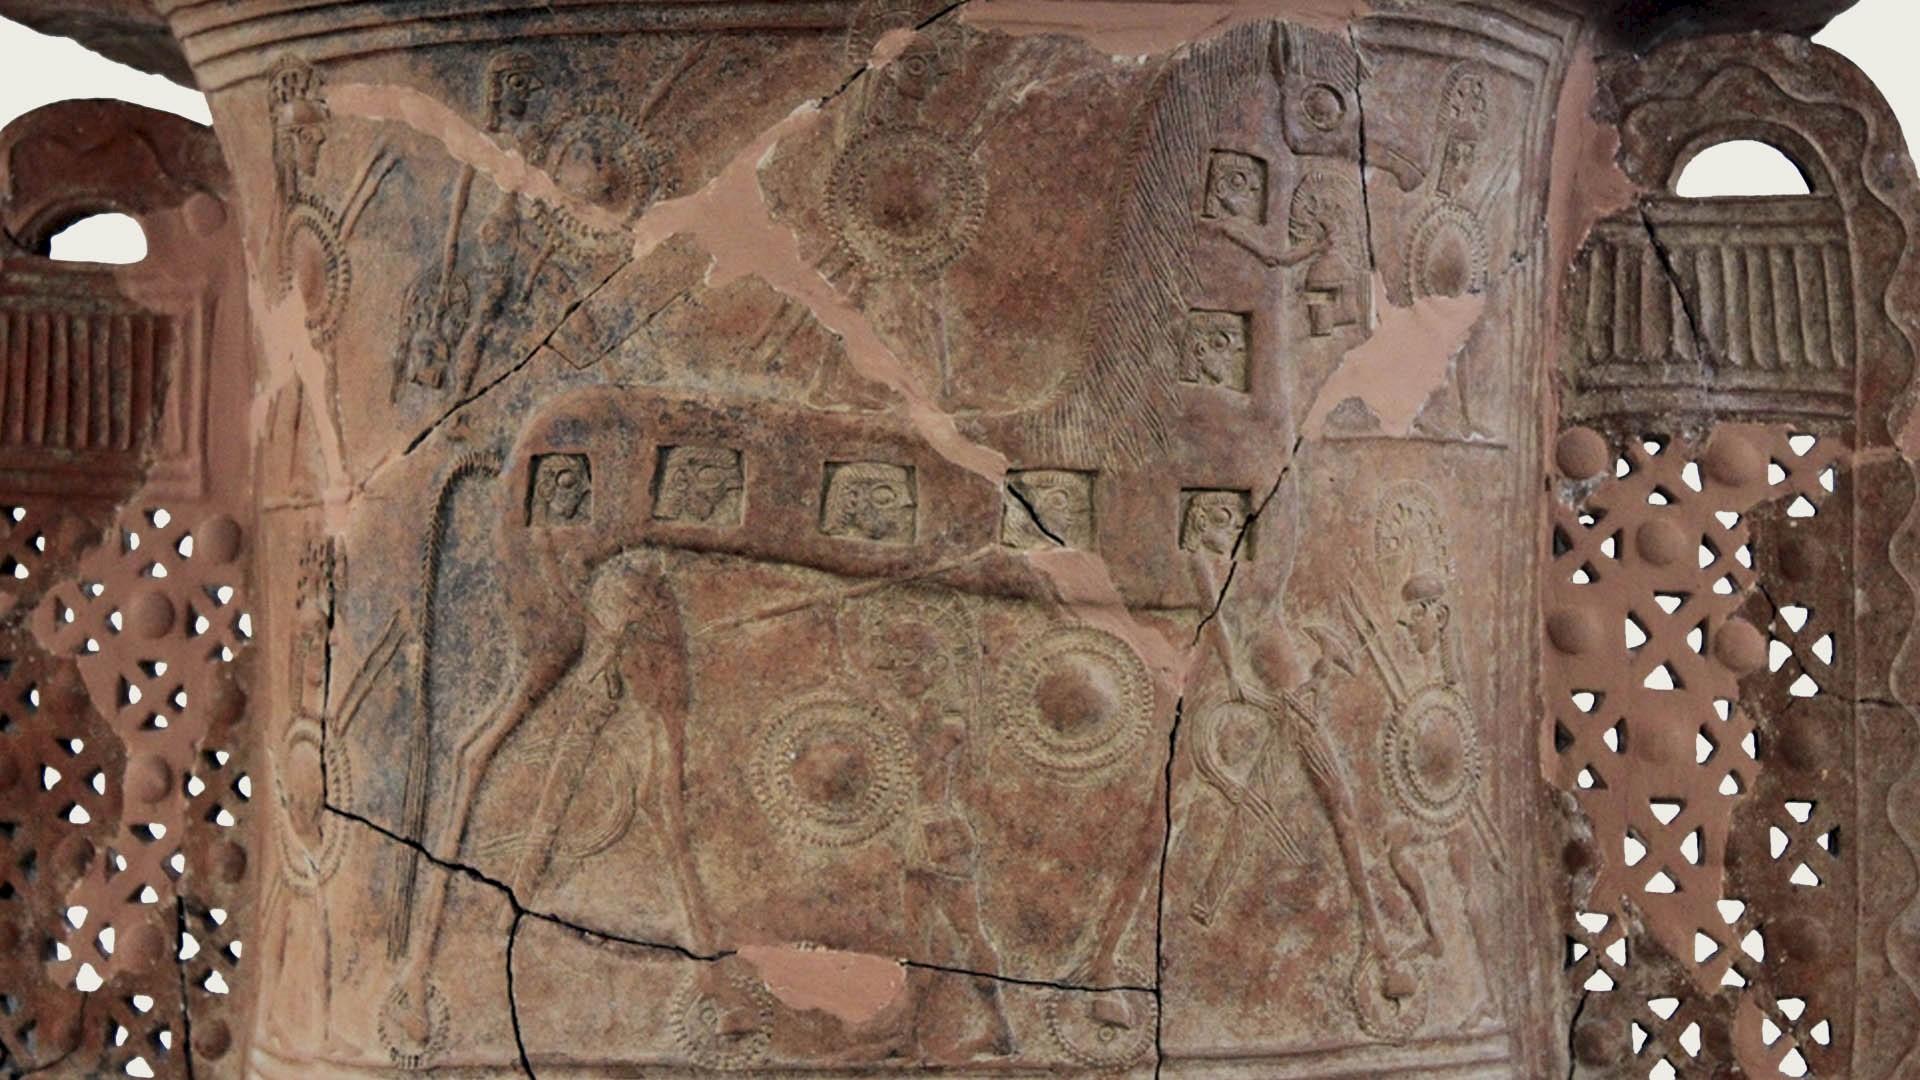 Троянский конь на пифосе с&nbsp;Миконоса. <br>